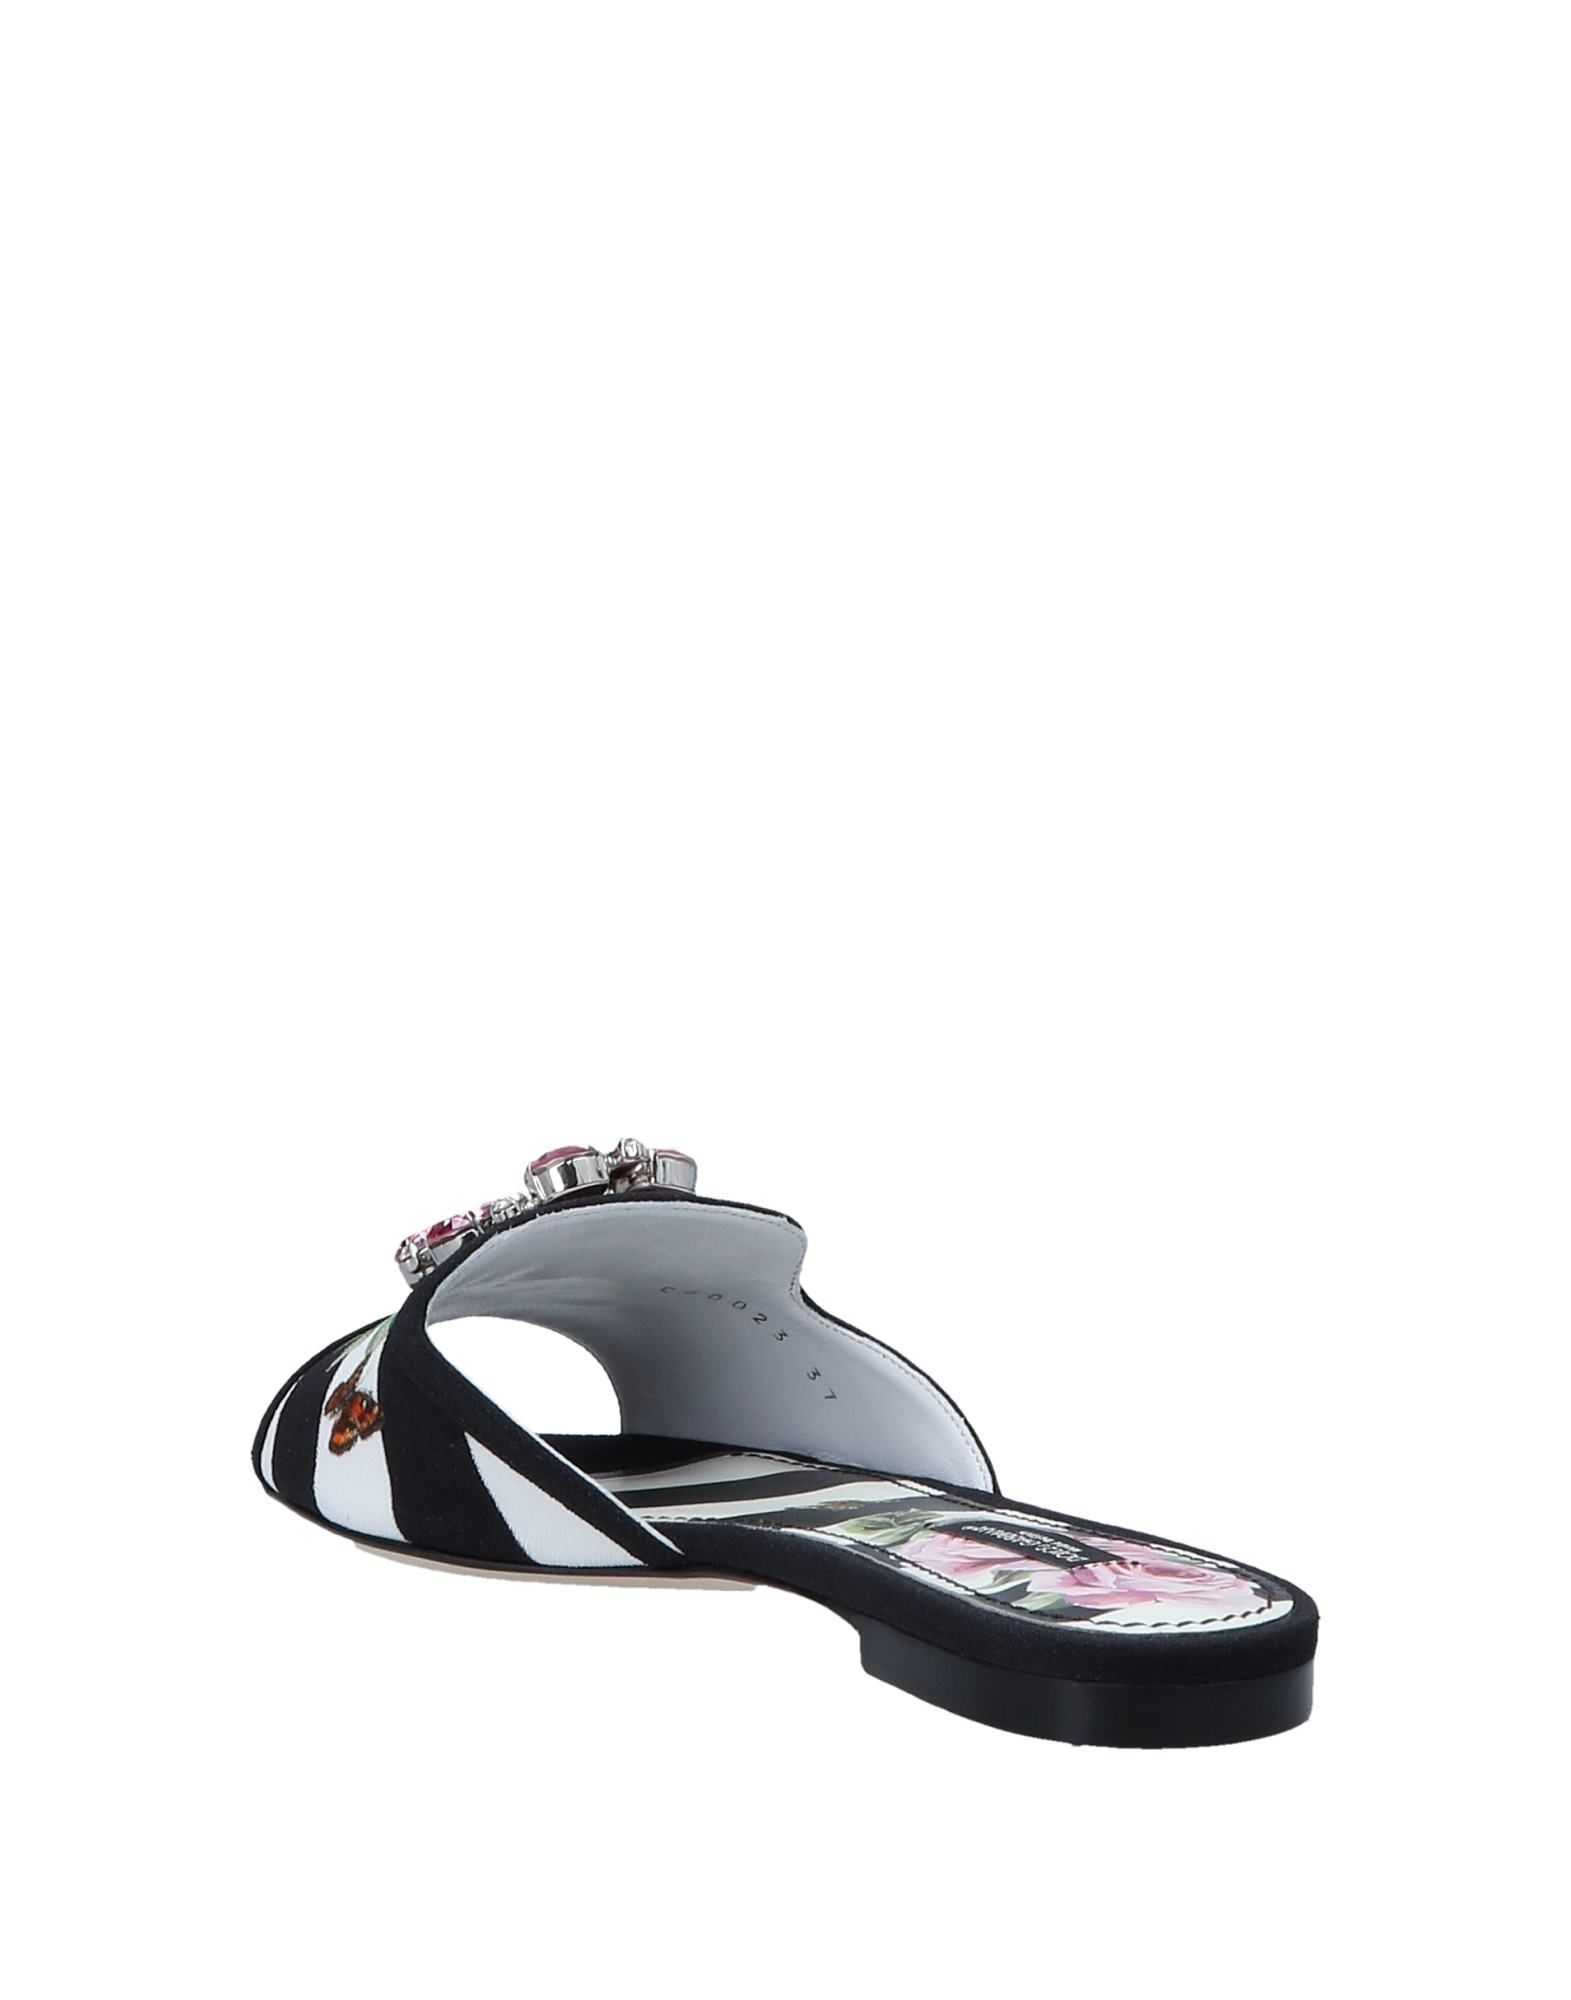 Dolce & Gabbana Sandalen Damen Gutes Preis-Leistungs-Verhältnis, Preis-Leistungs-Verhältnis, Preis-Leistungs-Verhältnis, es lohnt sich c07332